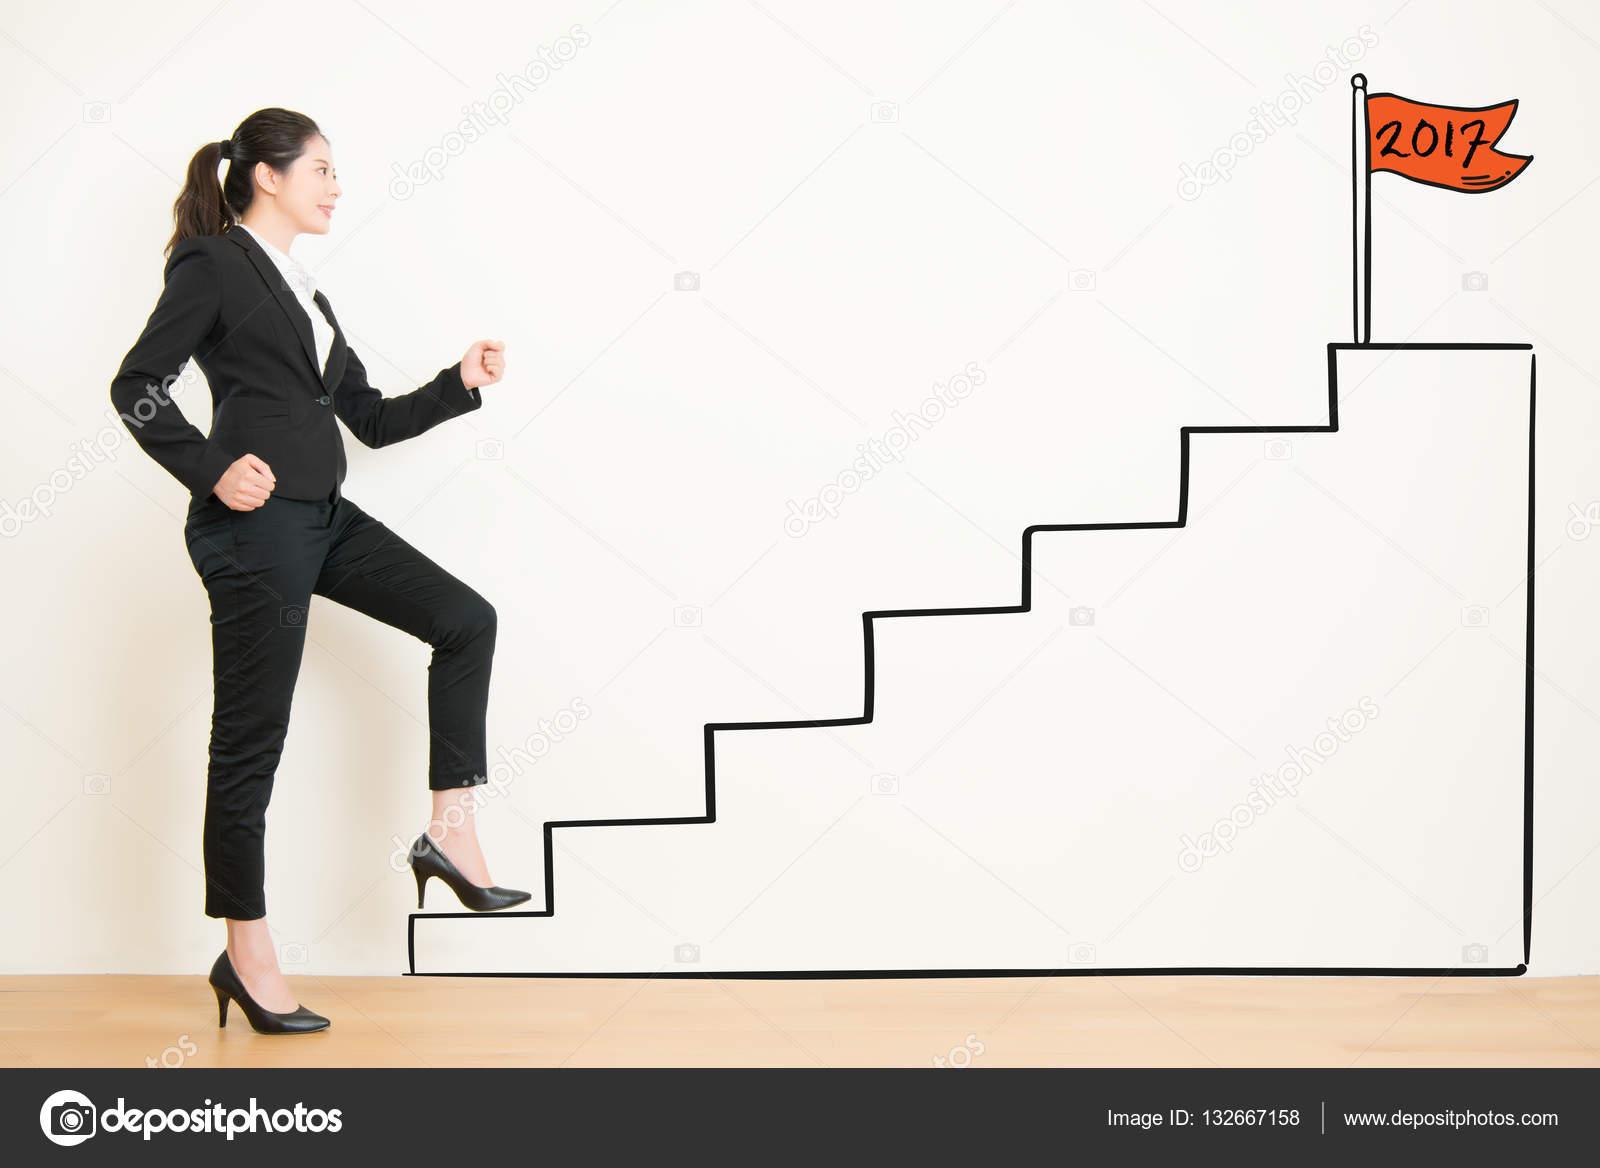 Лестница к успеху своими руками